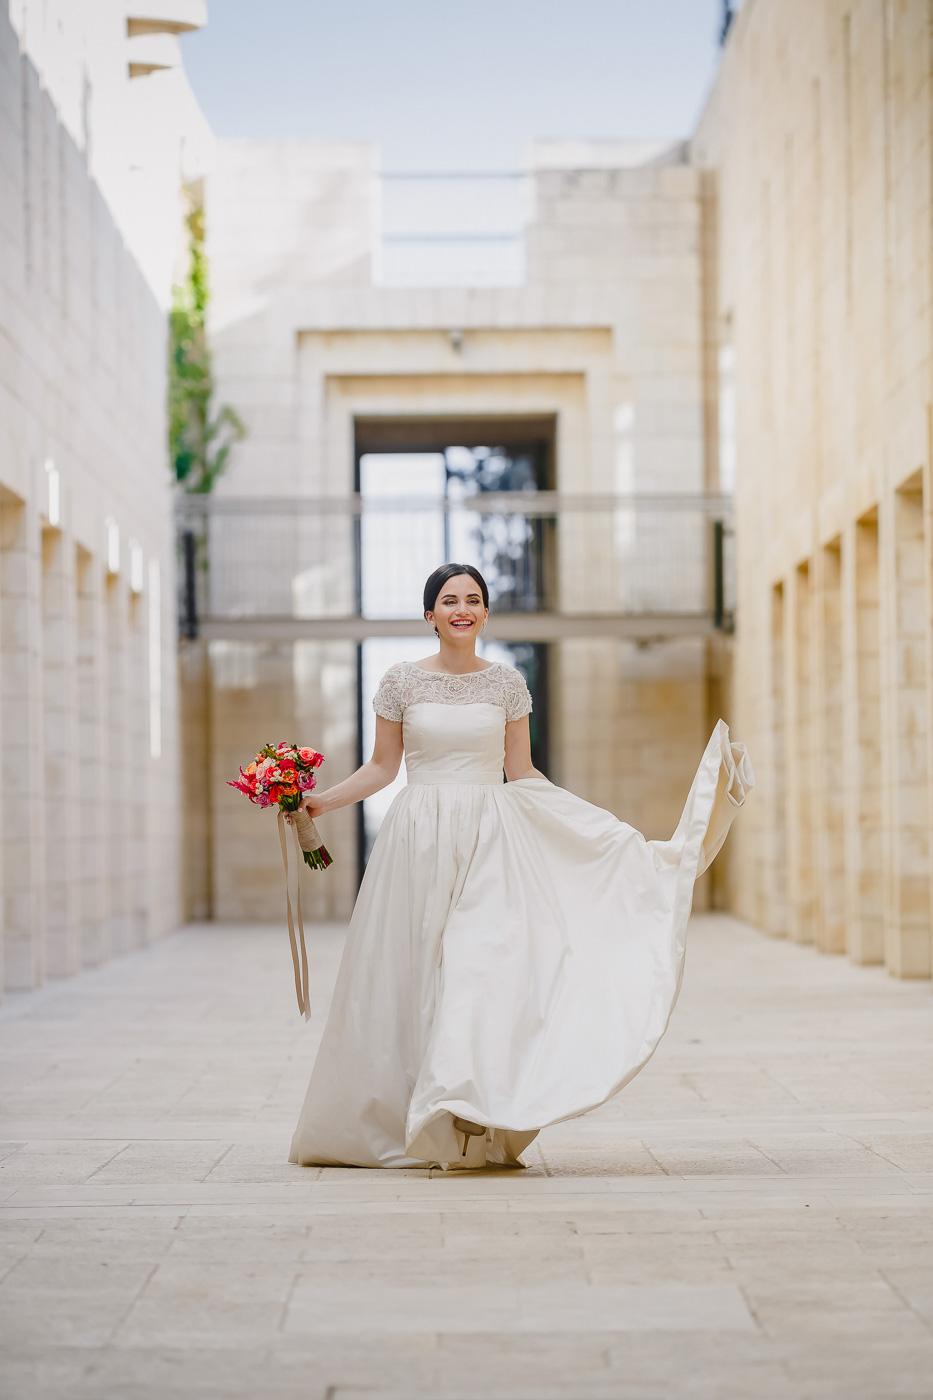 Leah+Allan_wedding_0139.jpg